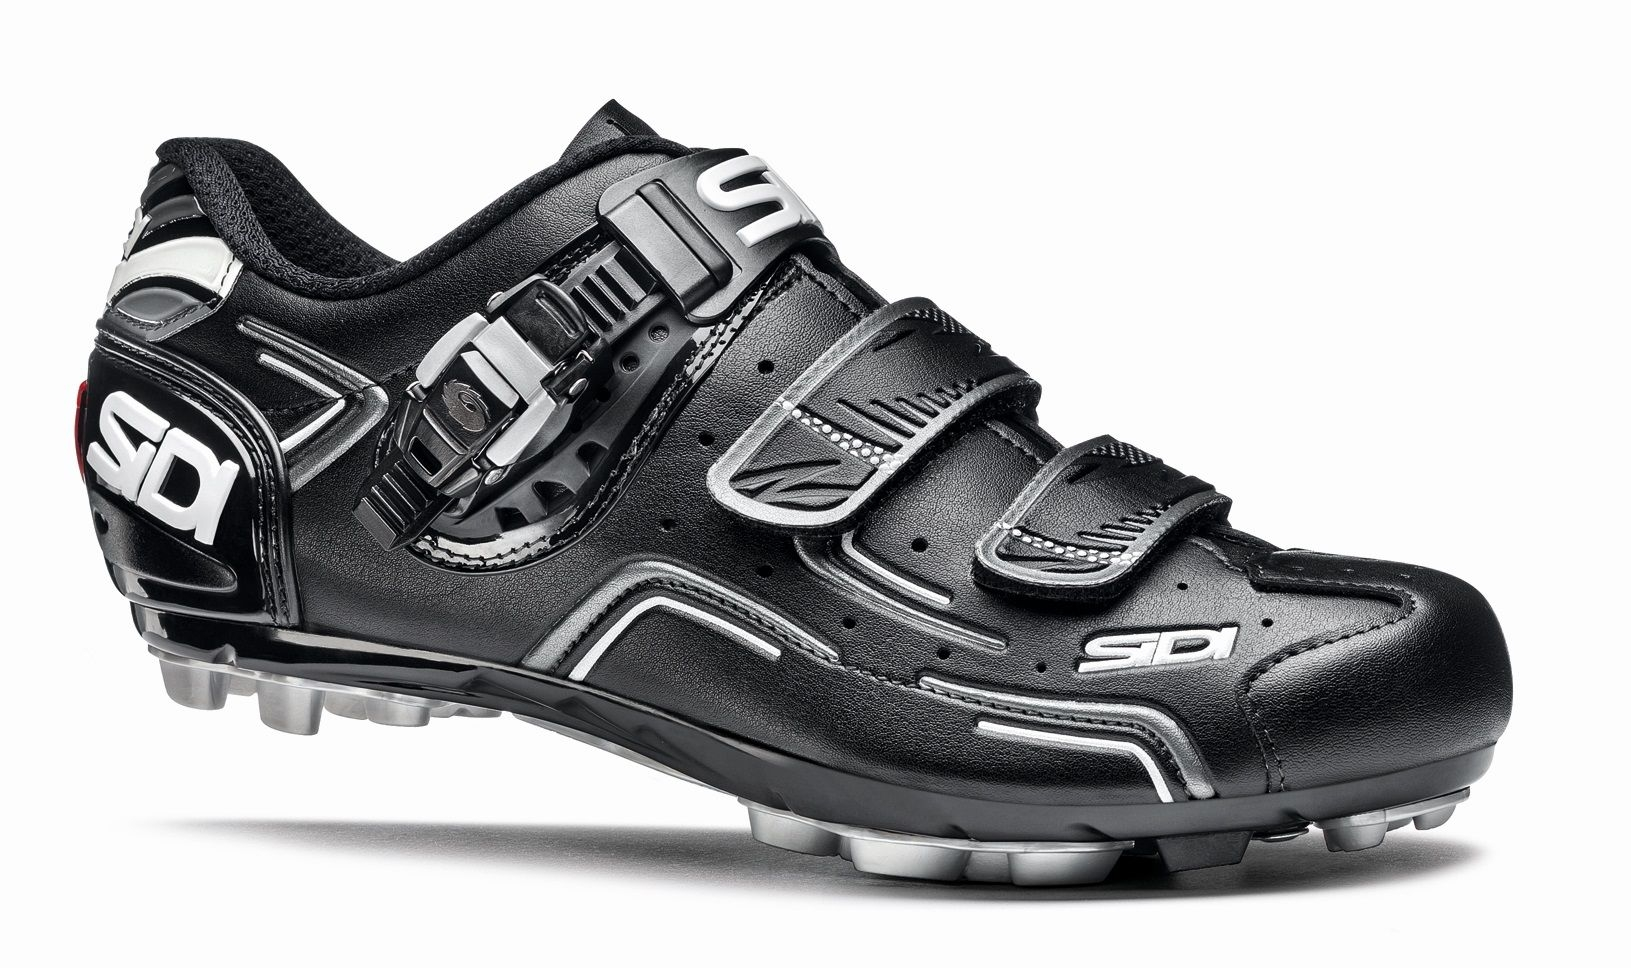 Chaussures Sidi MTB BUVEL noir - 41